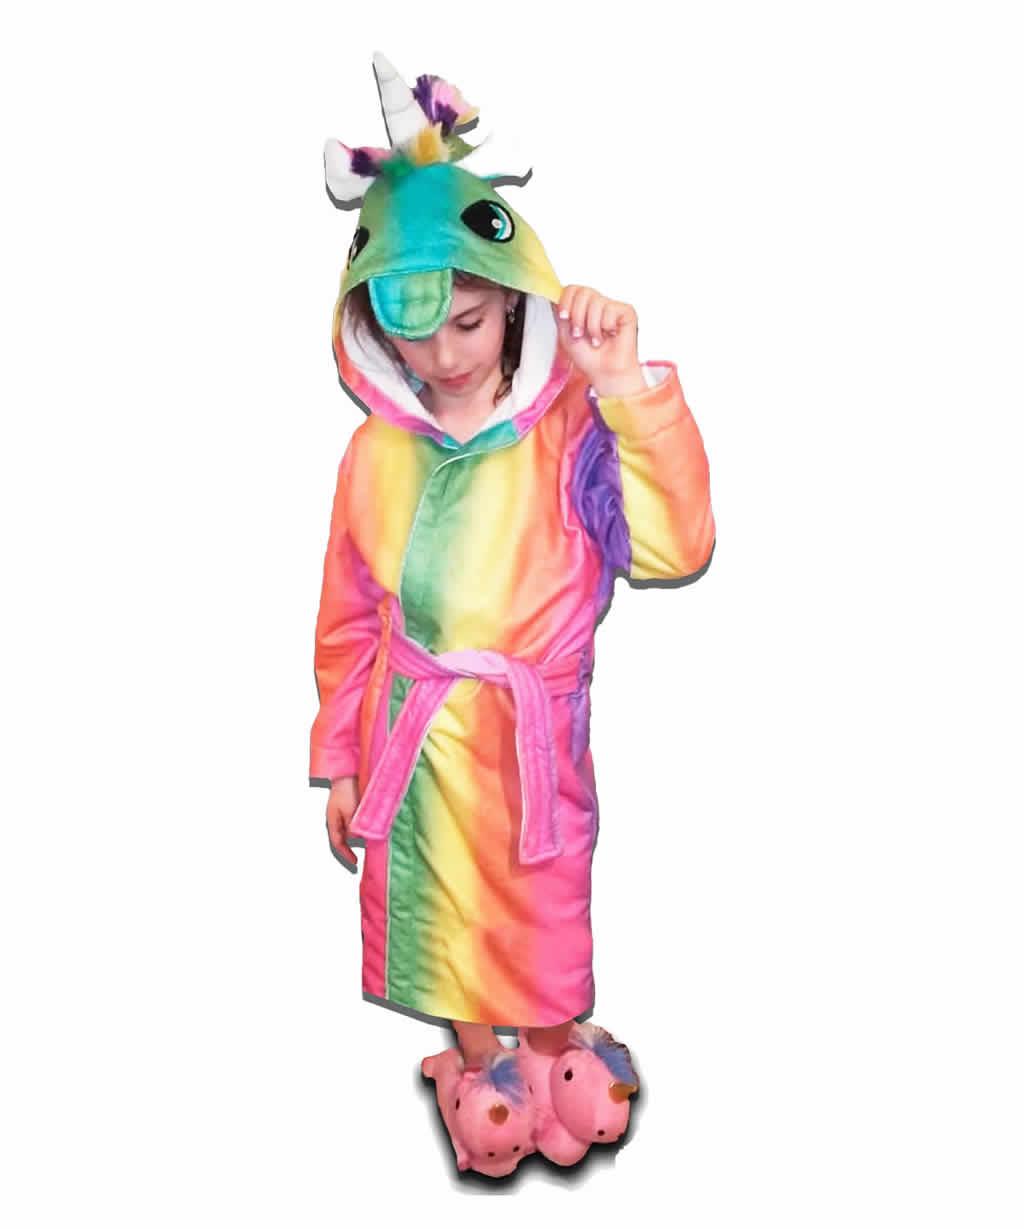 Bata Baño Toalla Infantil Capucha Unicornio Talles 10 y 14